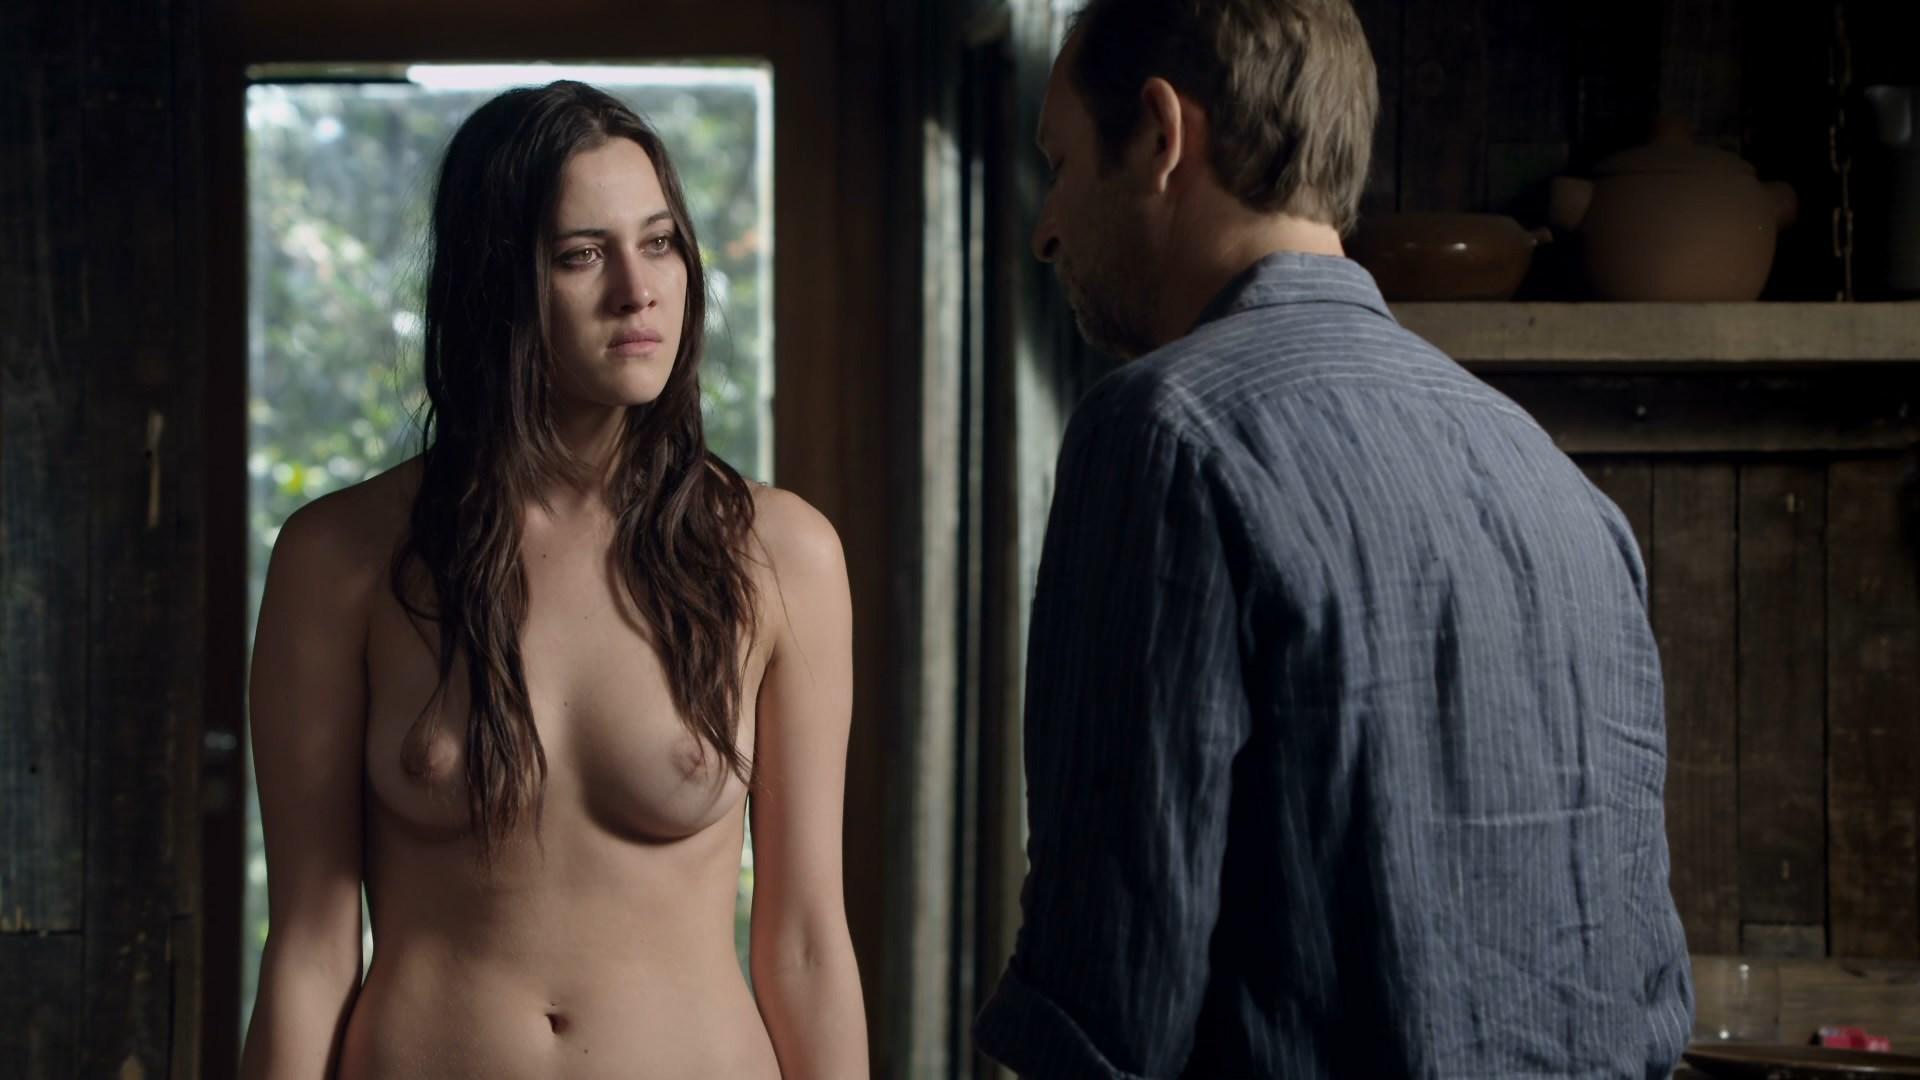 The dark knight picture banned sex scenes